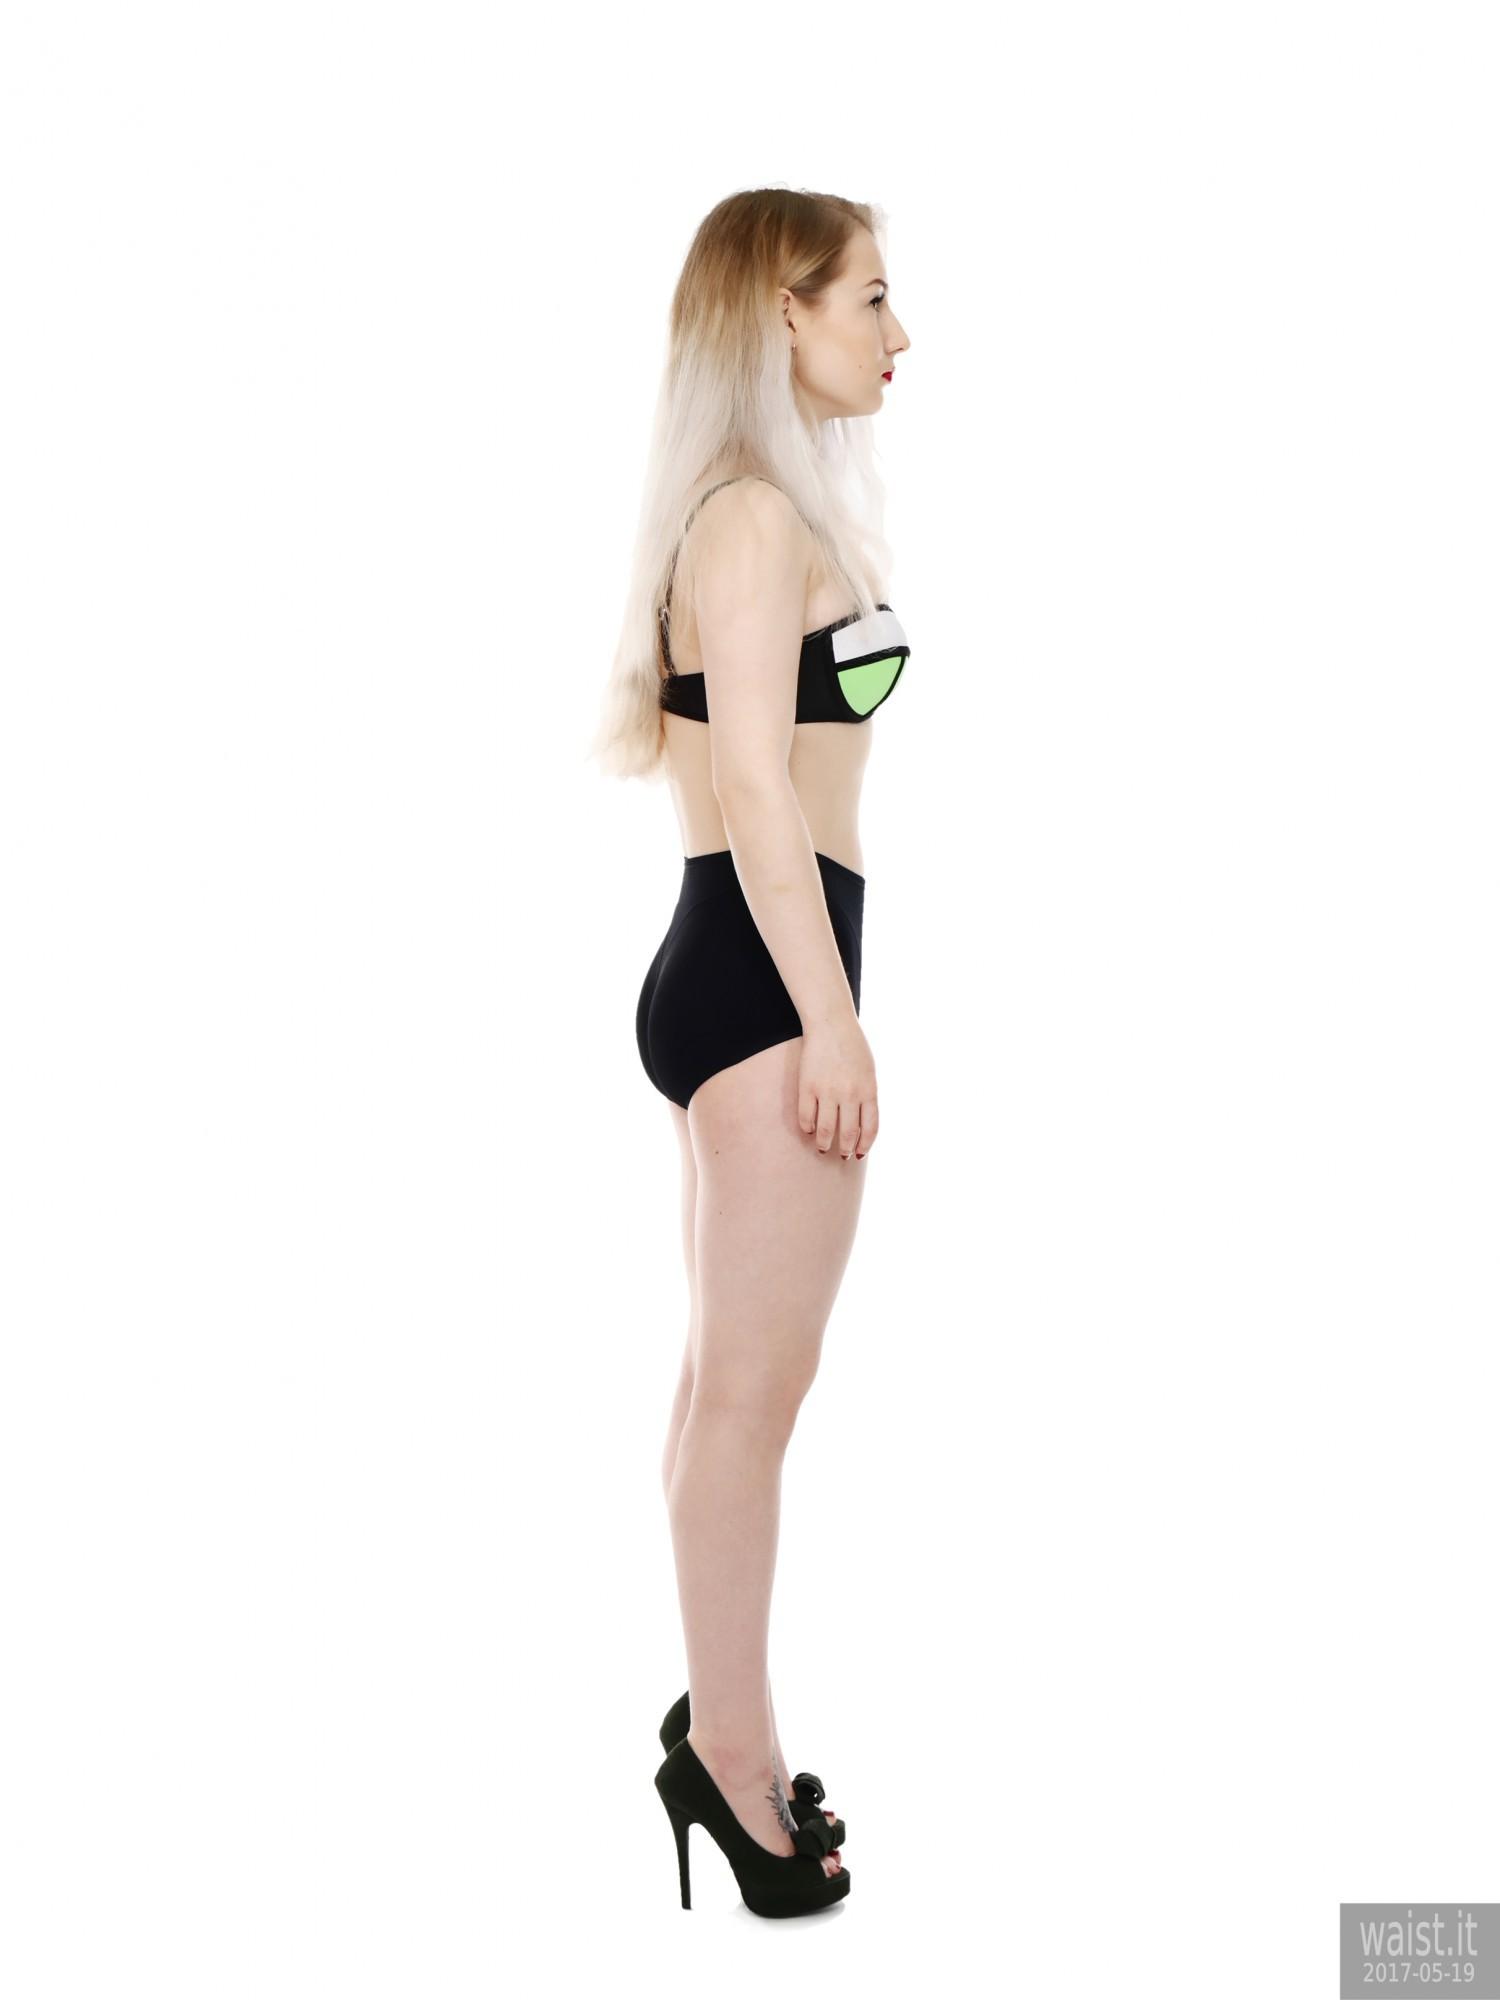 2017-05-19 Laura Sele bikini top and black control briefs worn as hotpants